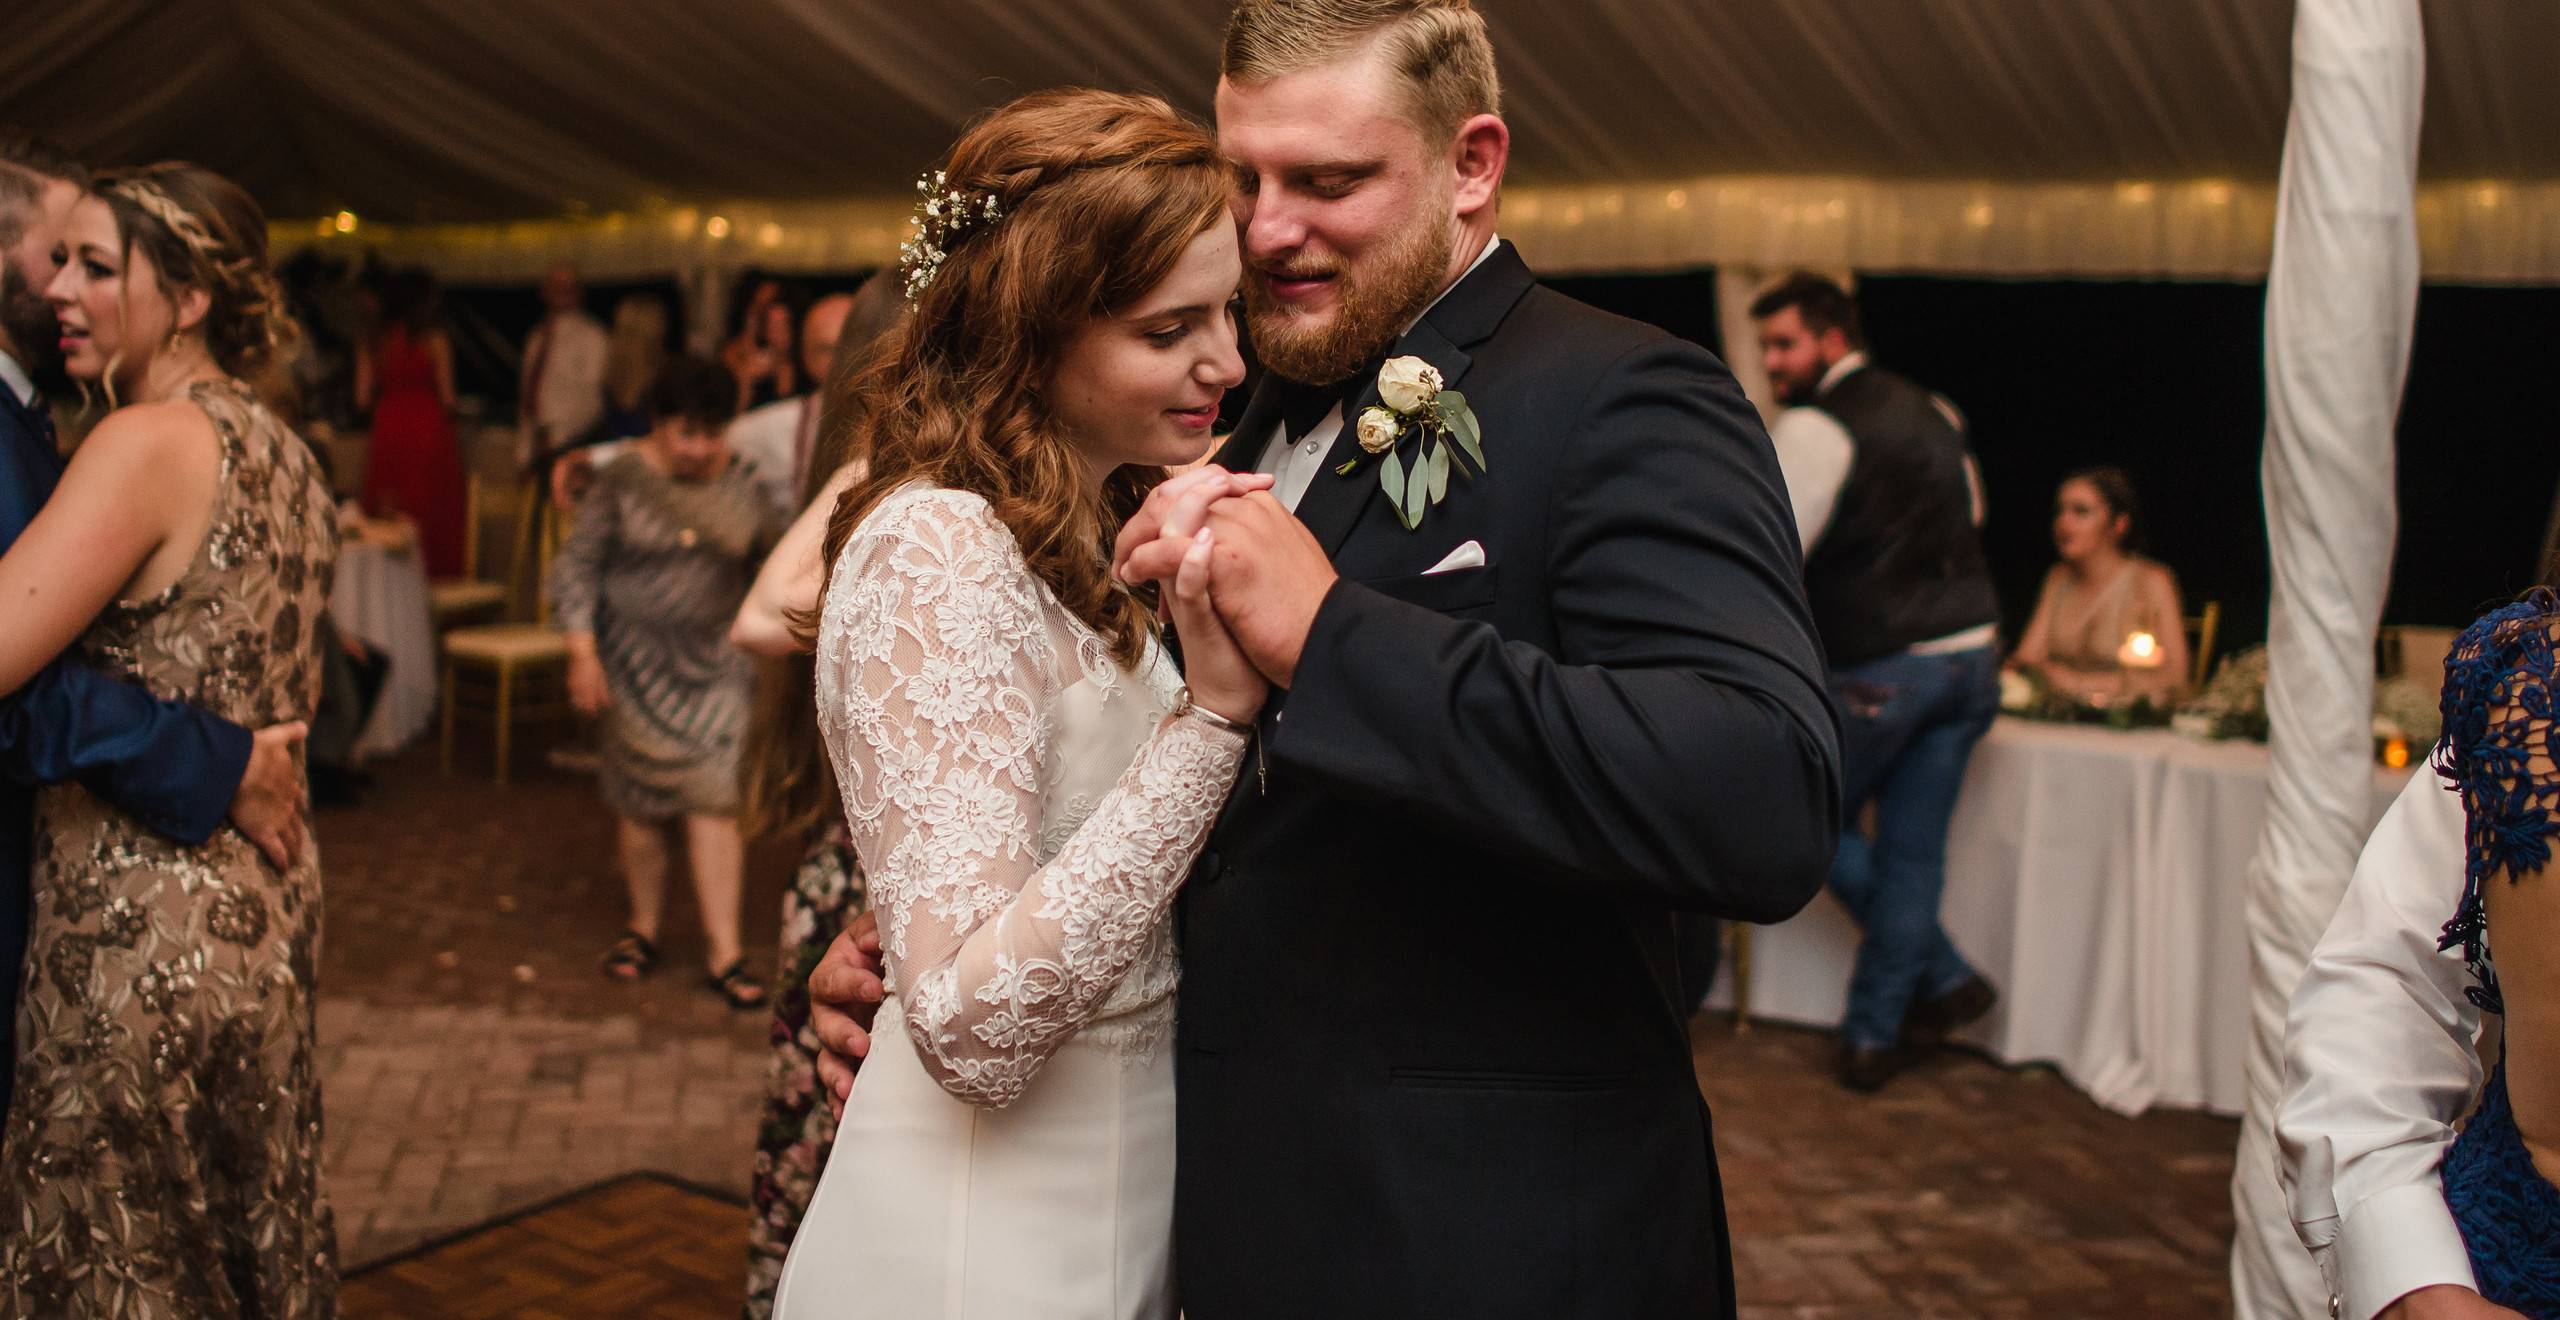 bride and groom slow dancing at wedding